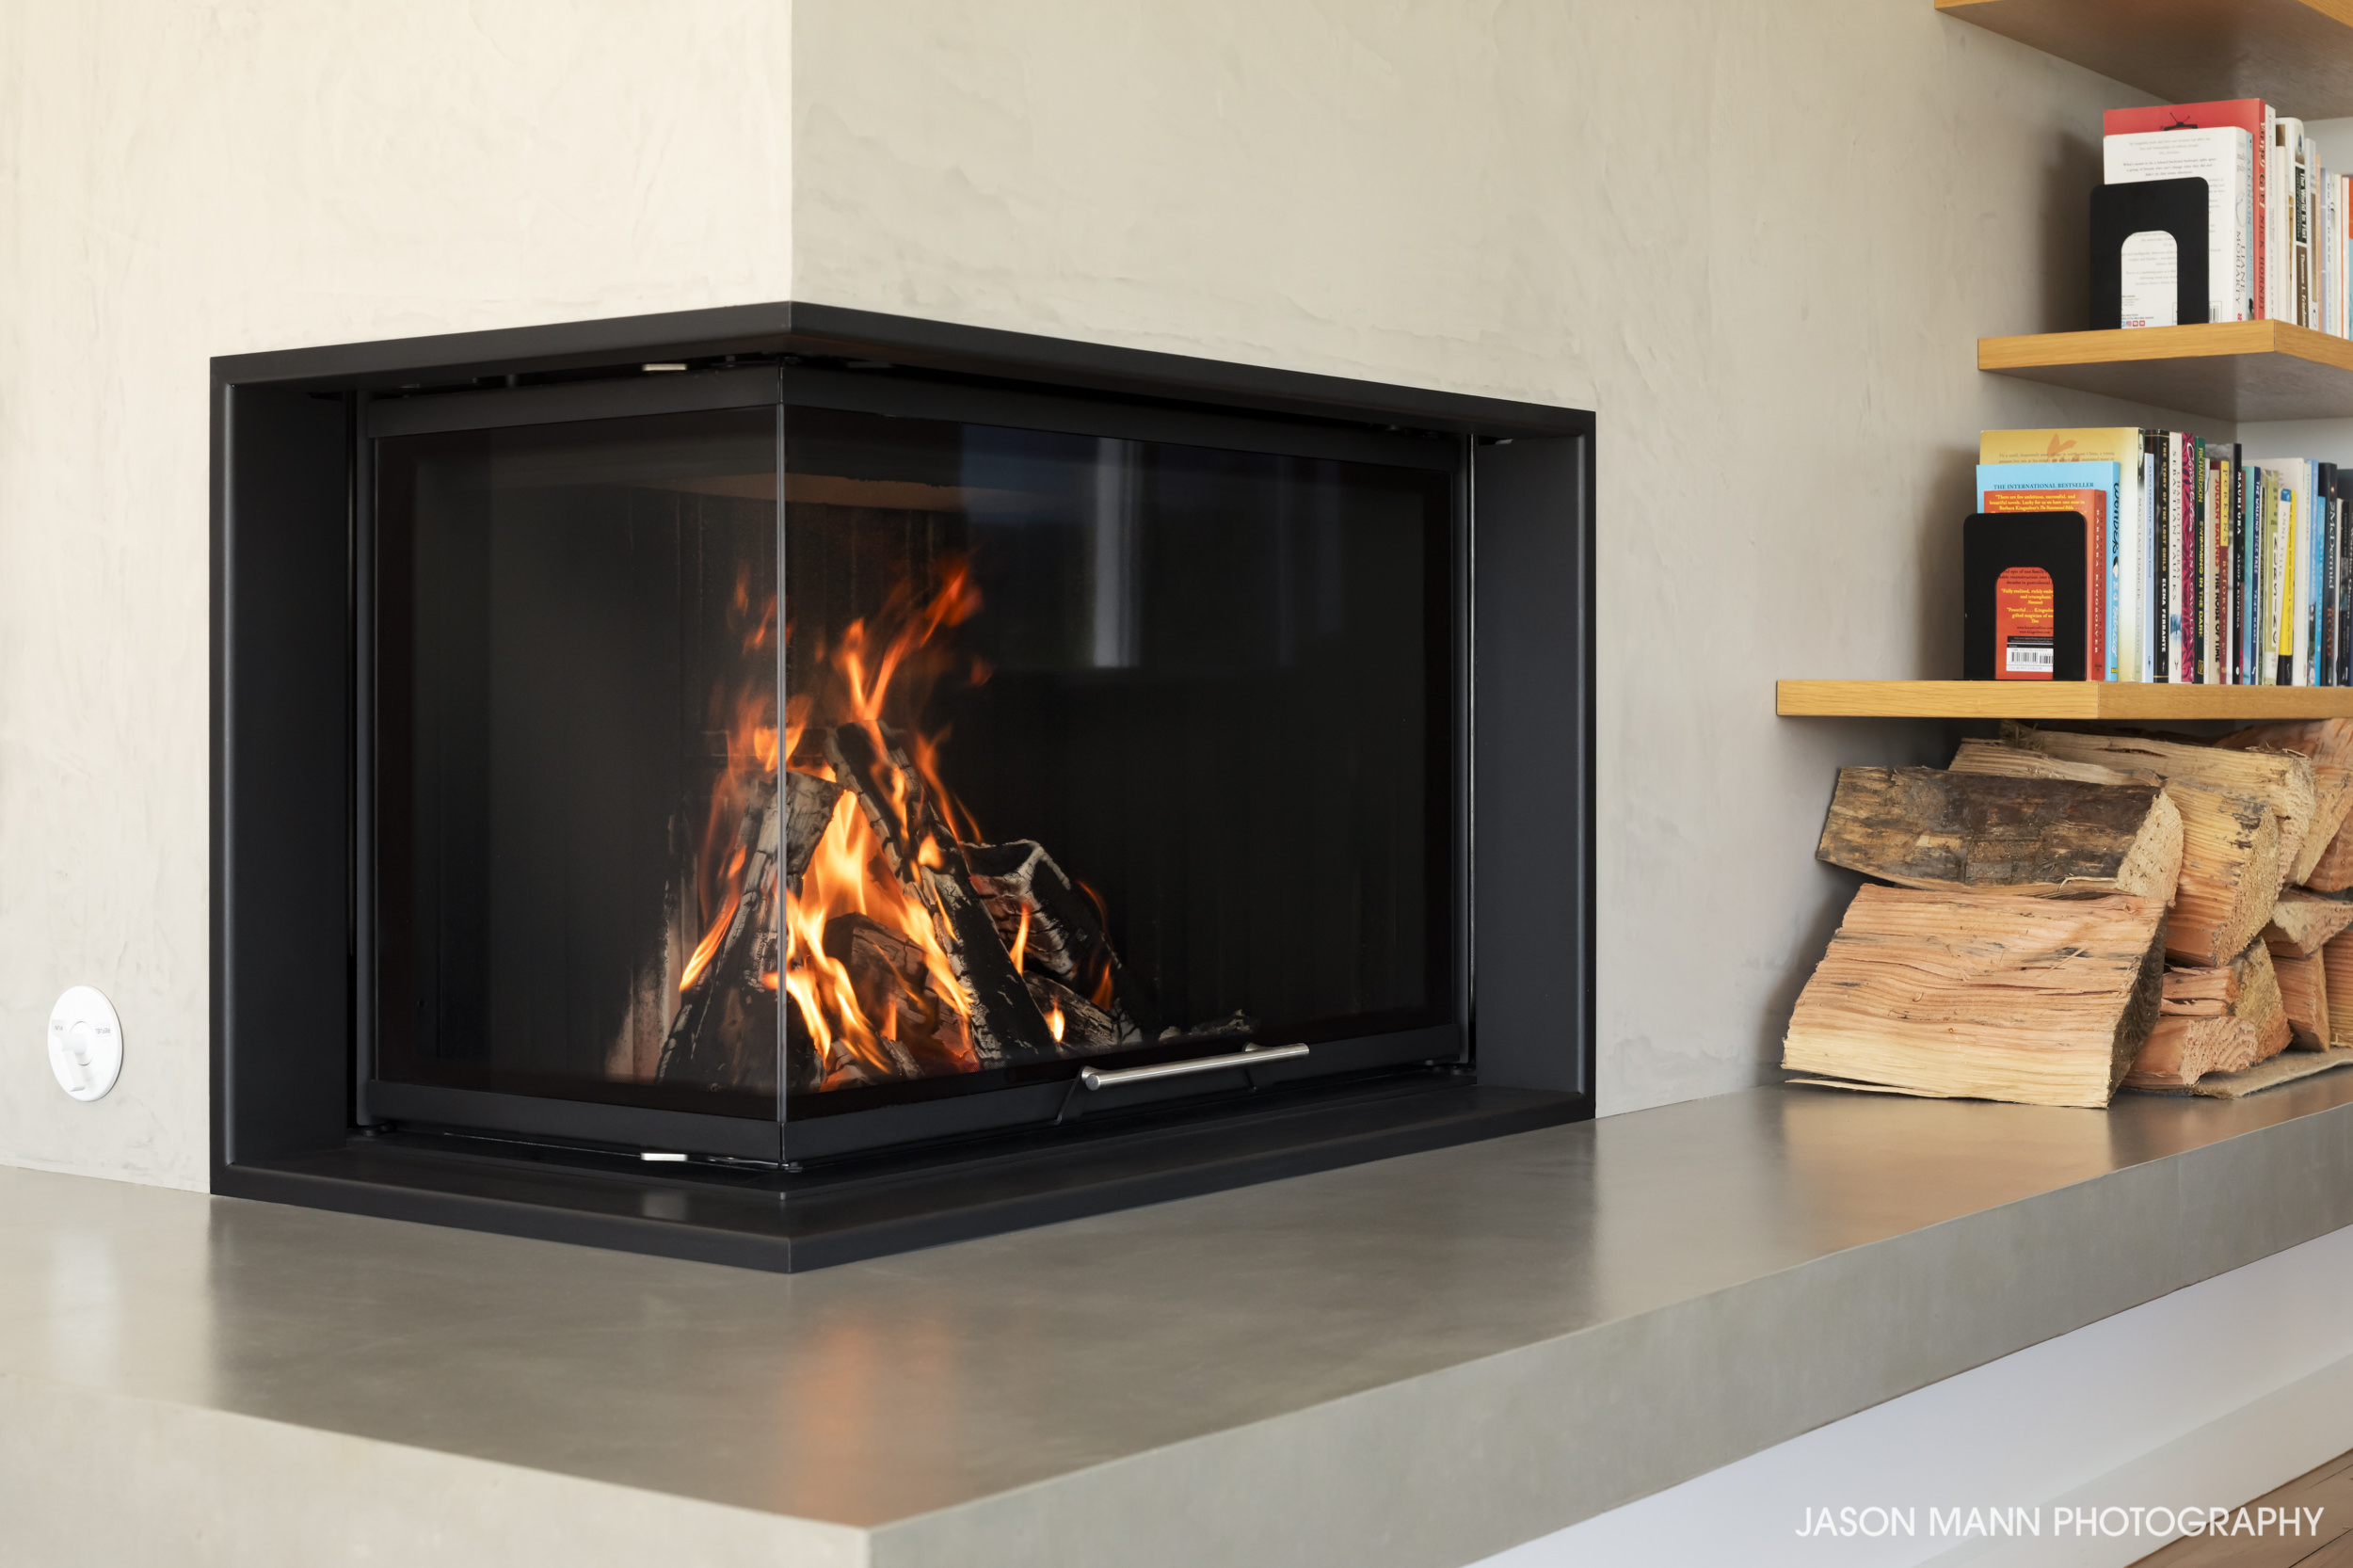 Jason_Mann_Fireplaces_06.jpg